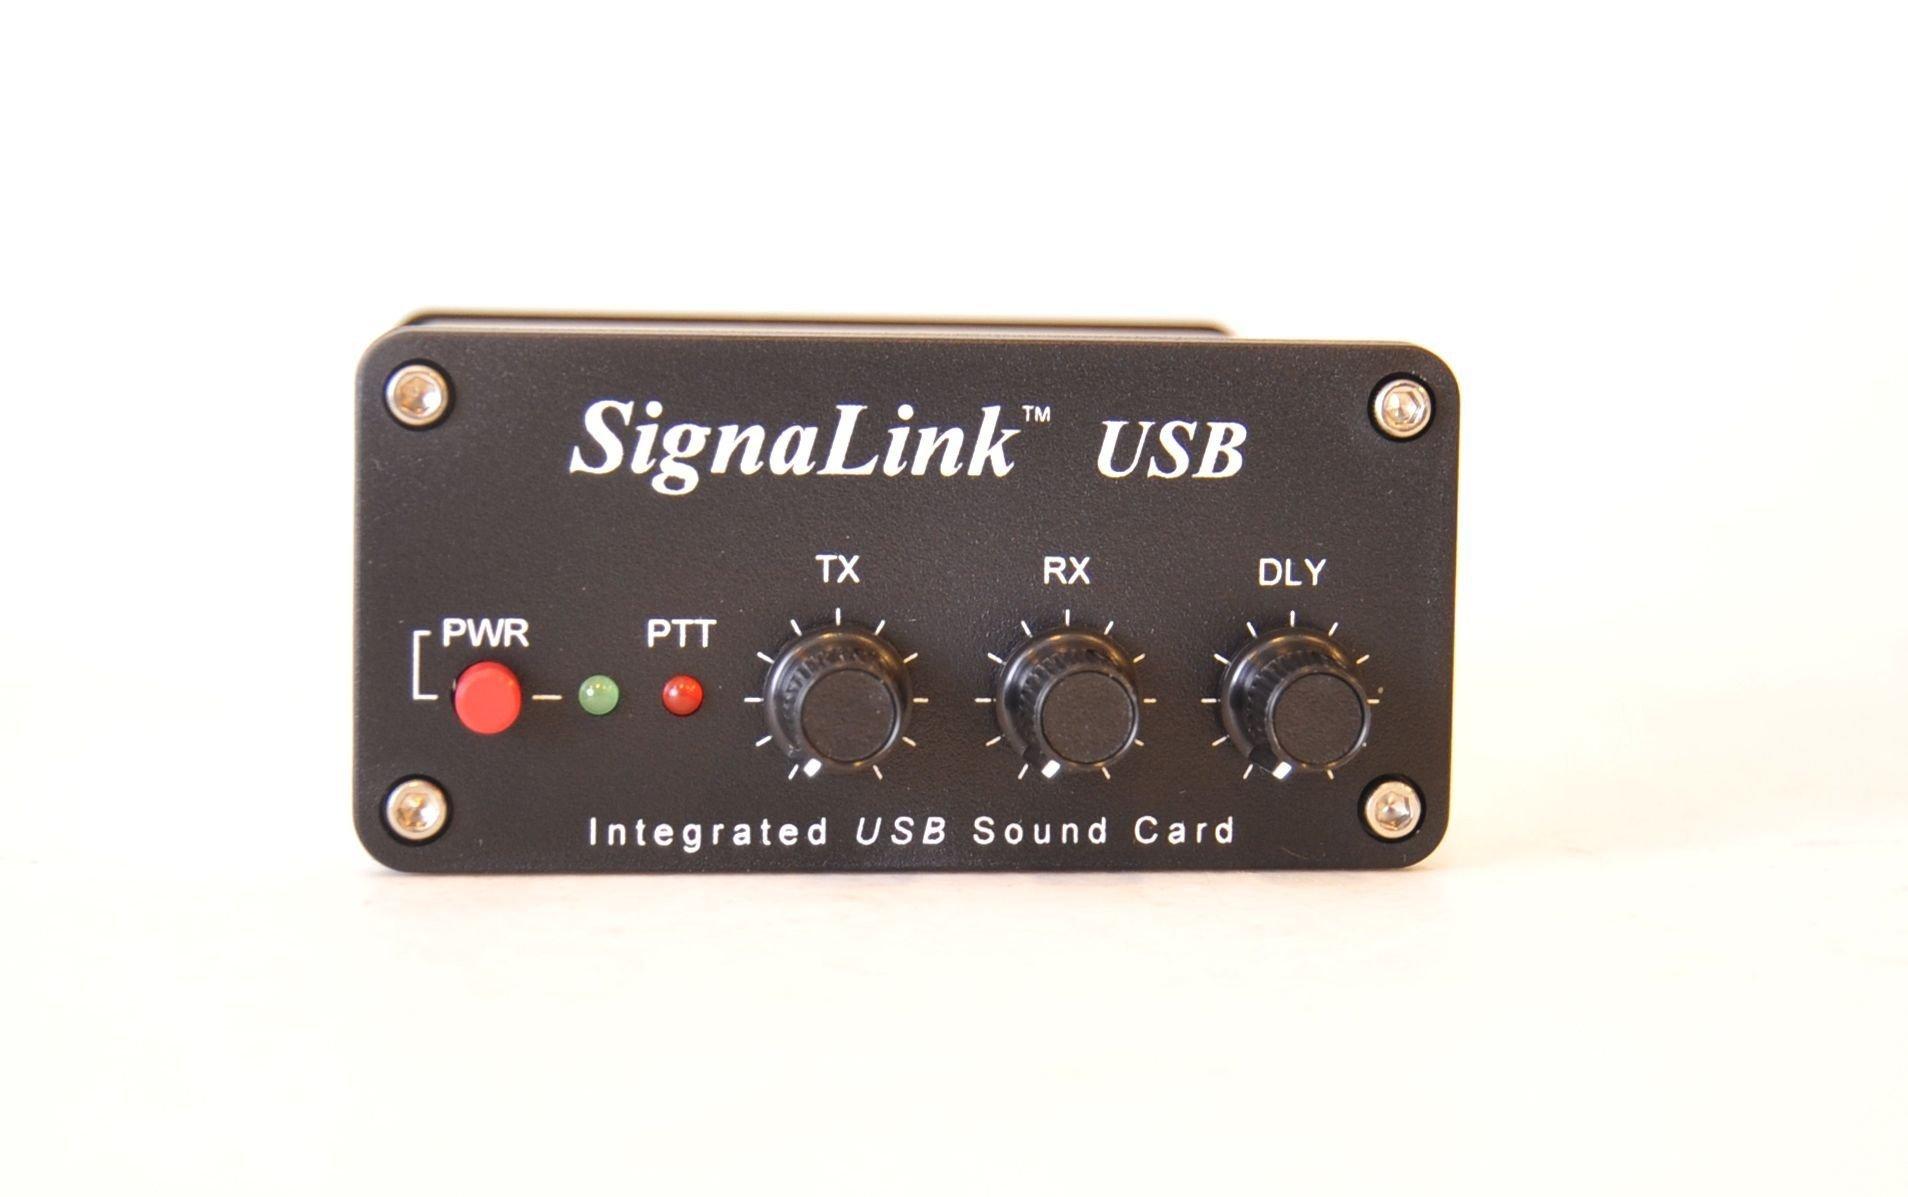 SLUSB5PD SIGNALINK USB FOR 5-PIN DIN DATA/ACC